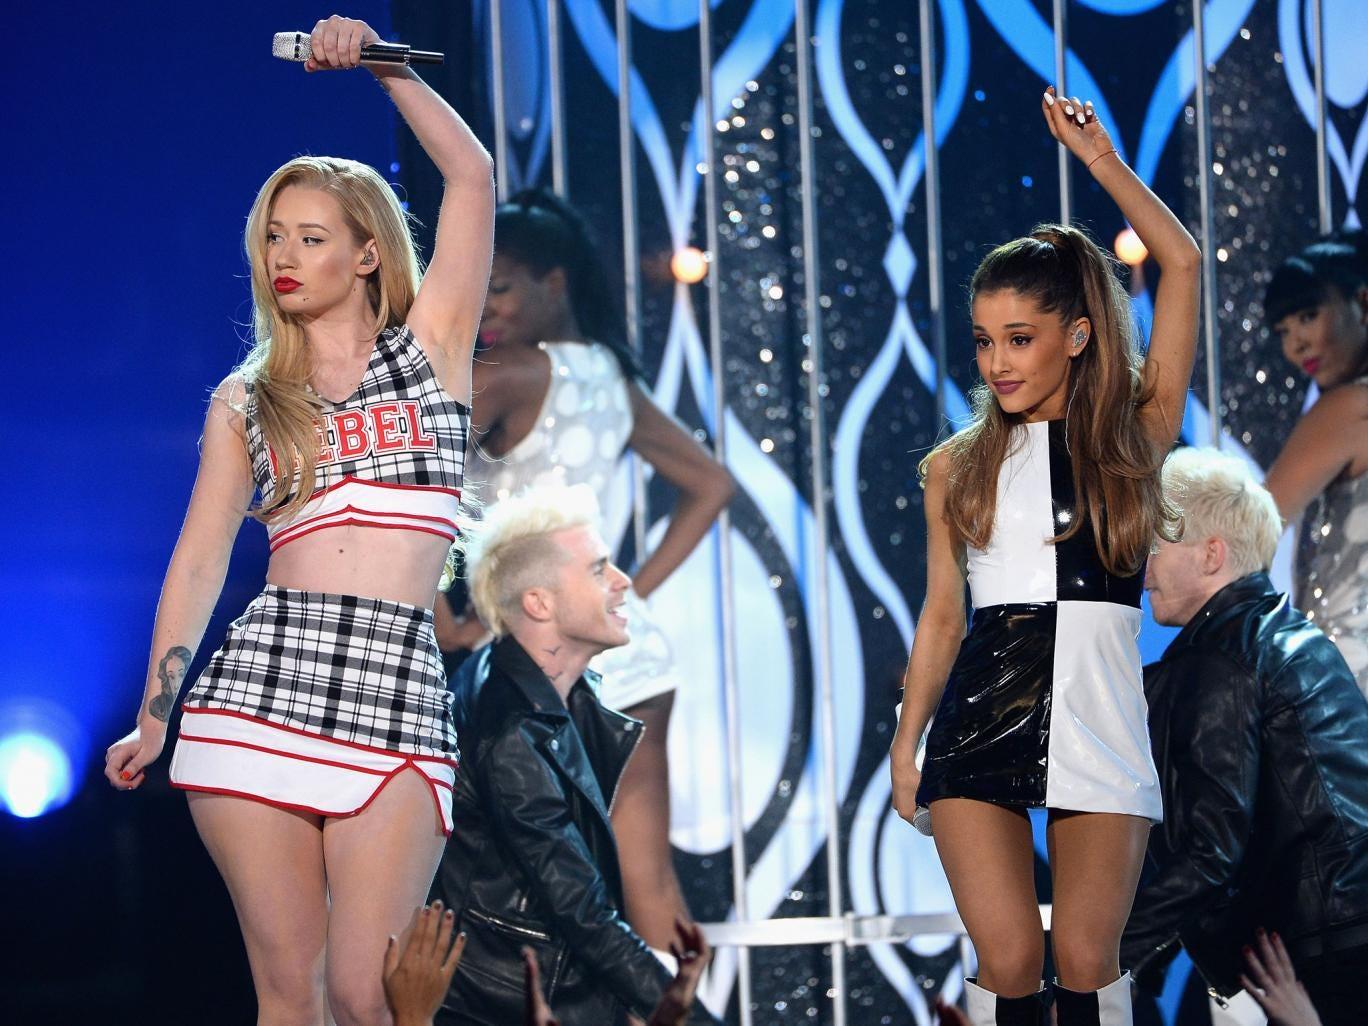 Ariana Grande and Iggy Azalea perform on stage at the Billboard Music Awards 2014